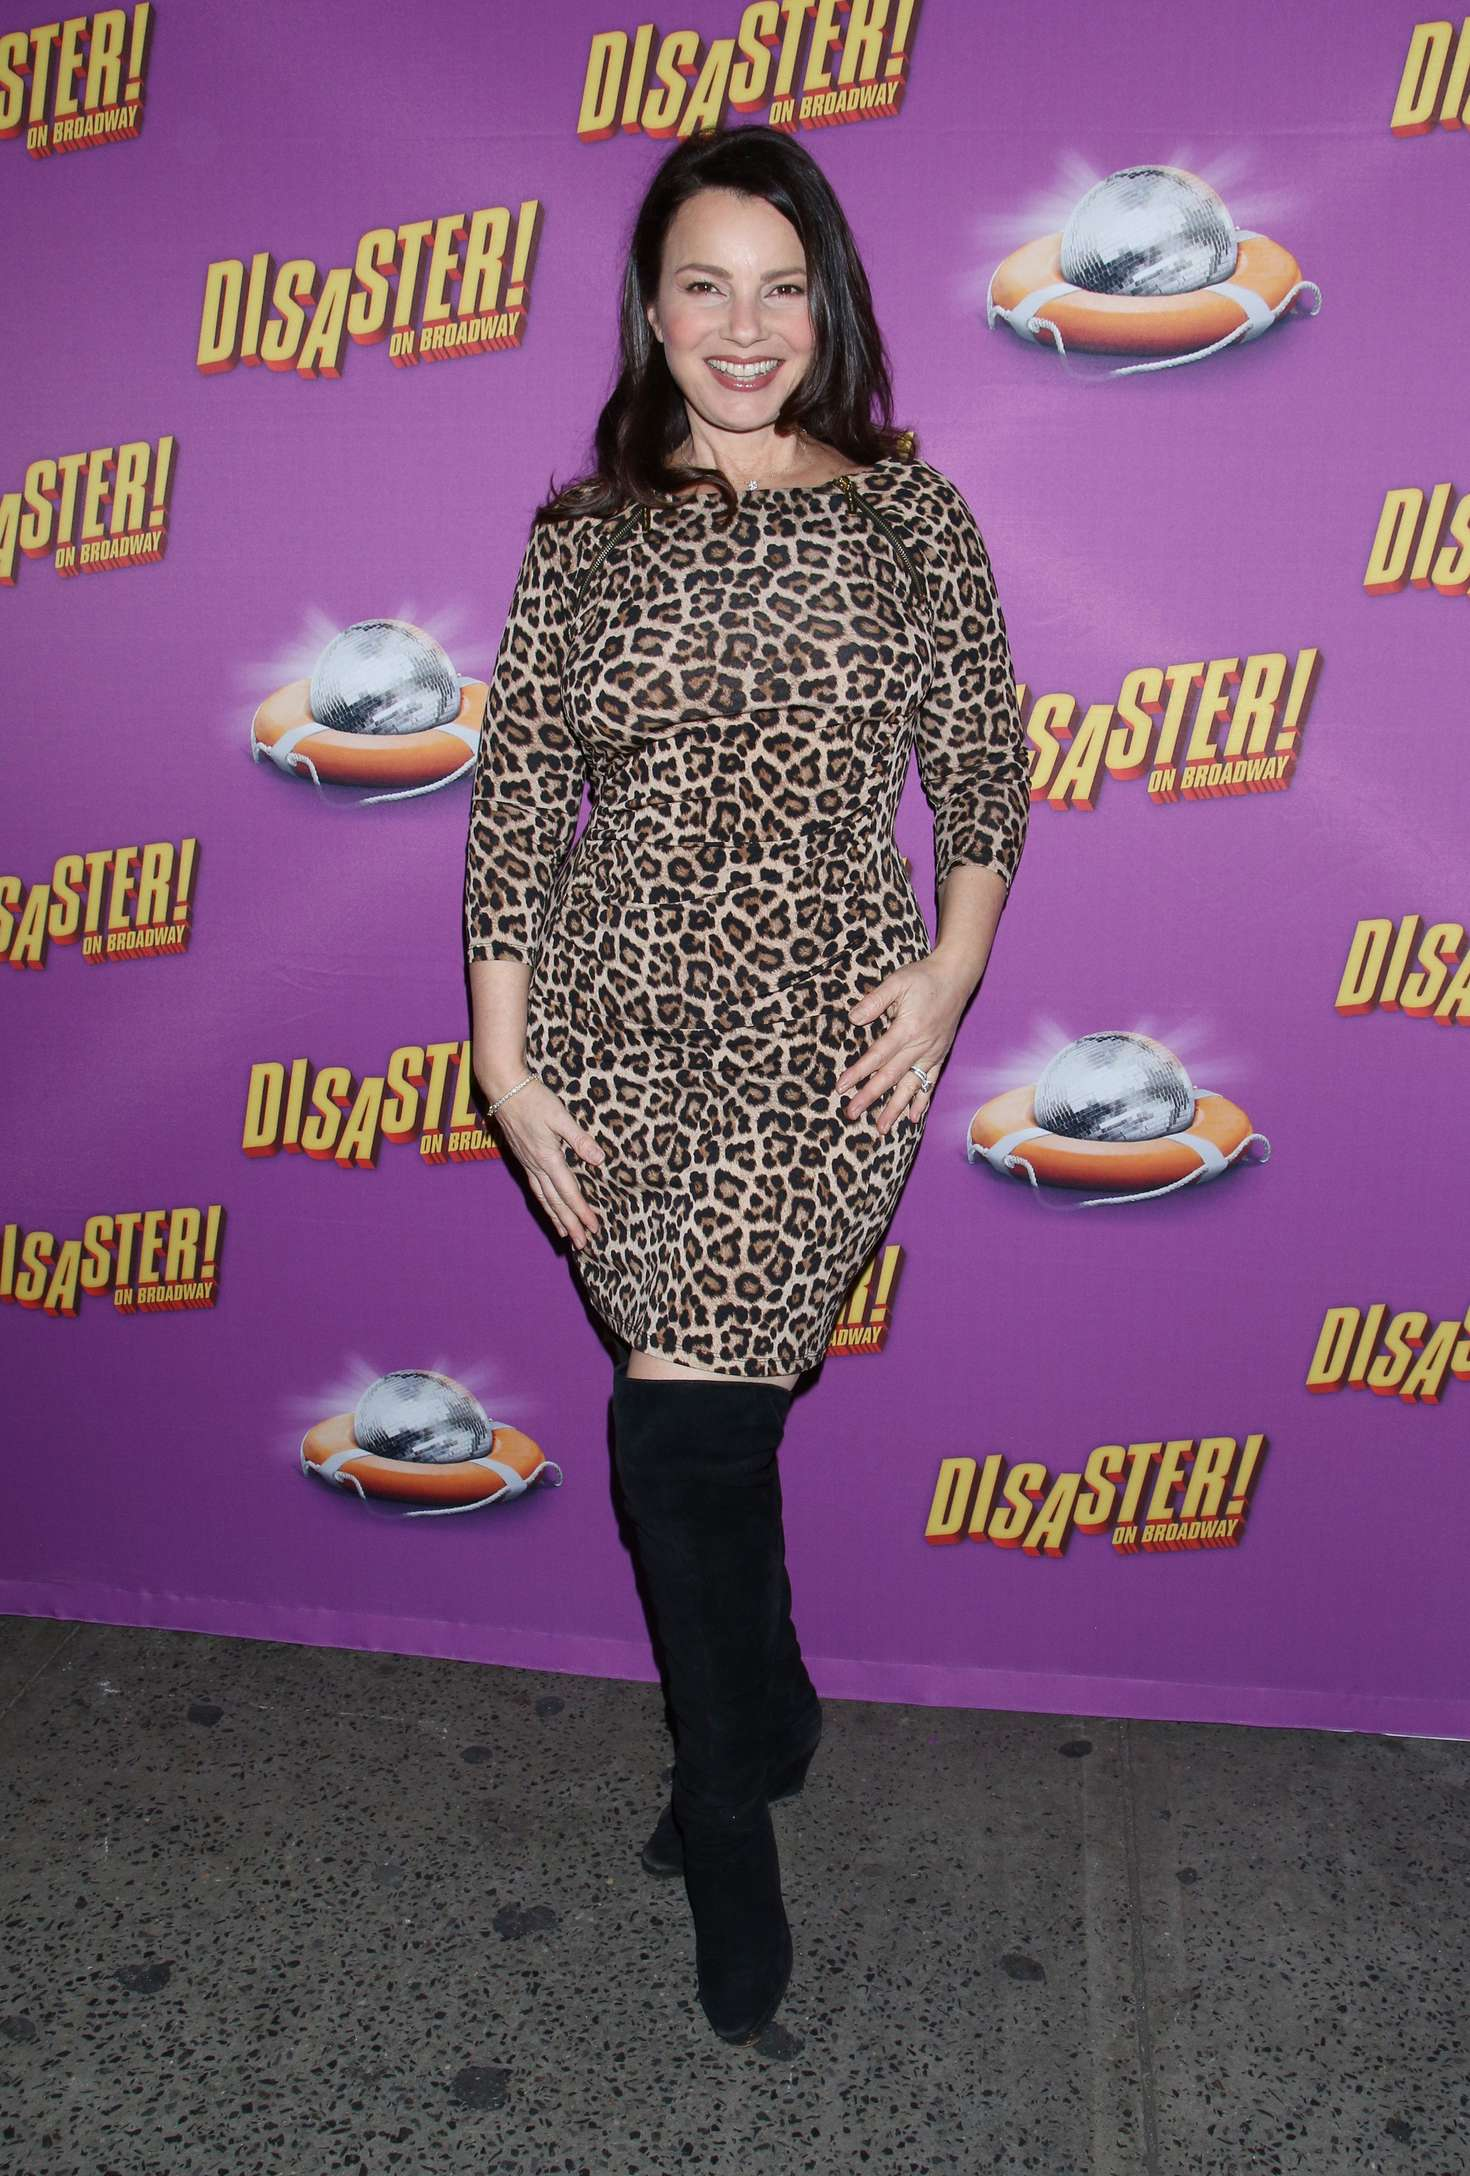 Fran Drescher Disaster Broadway Opening Night in New York